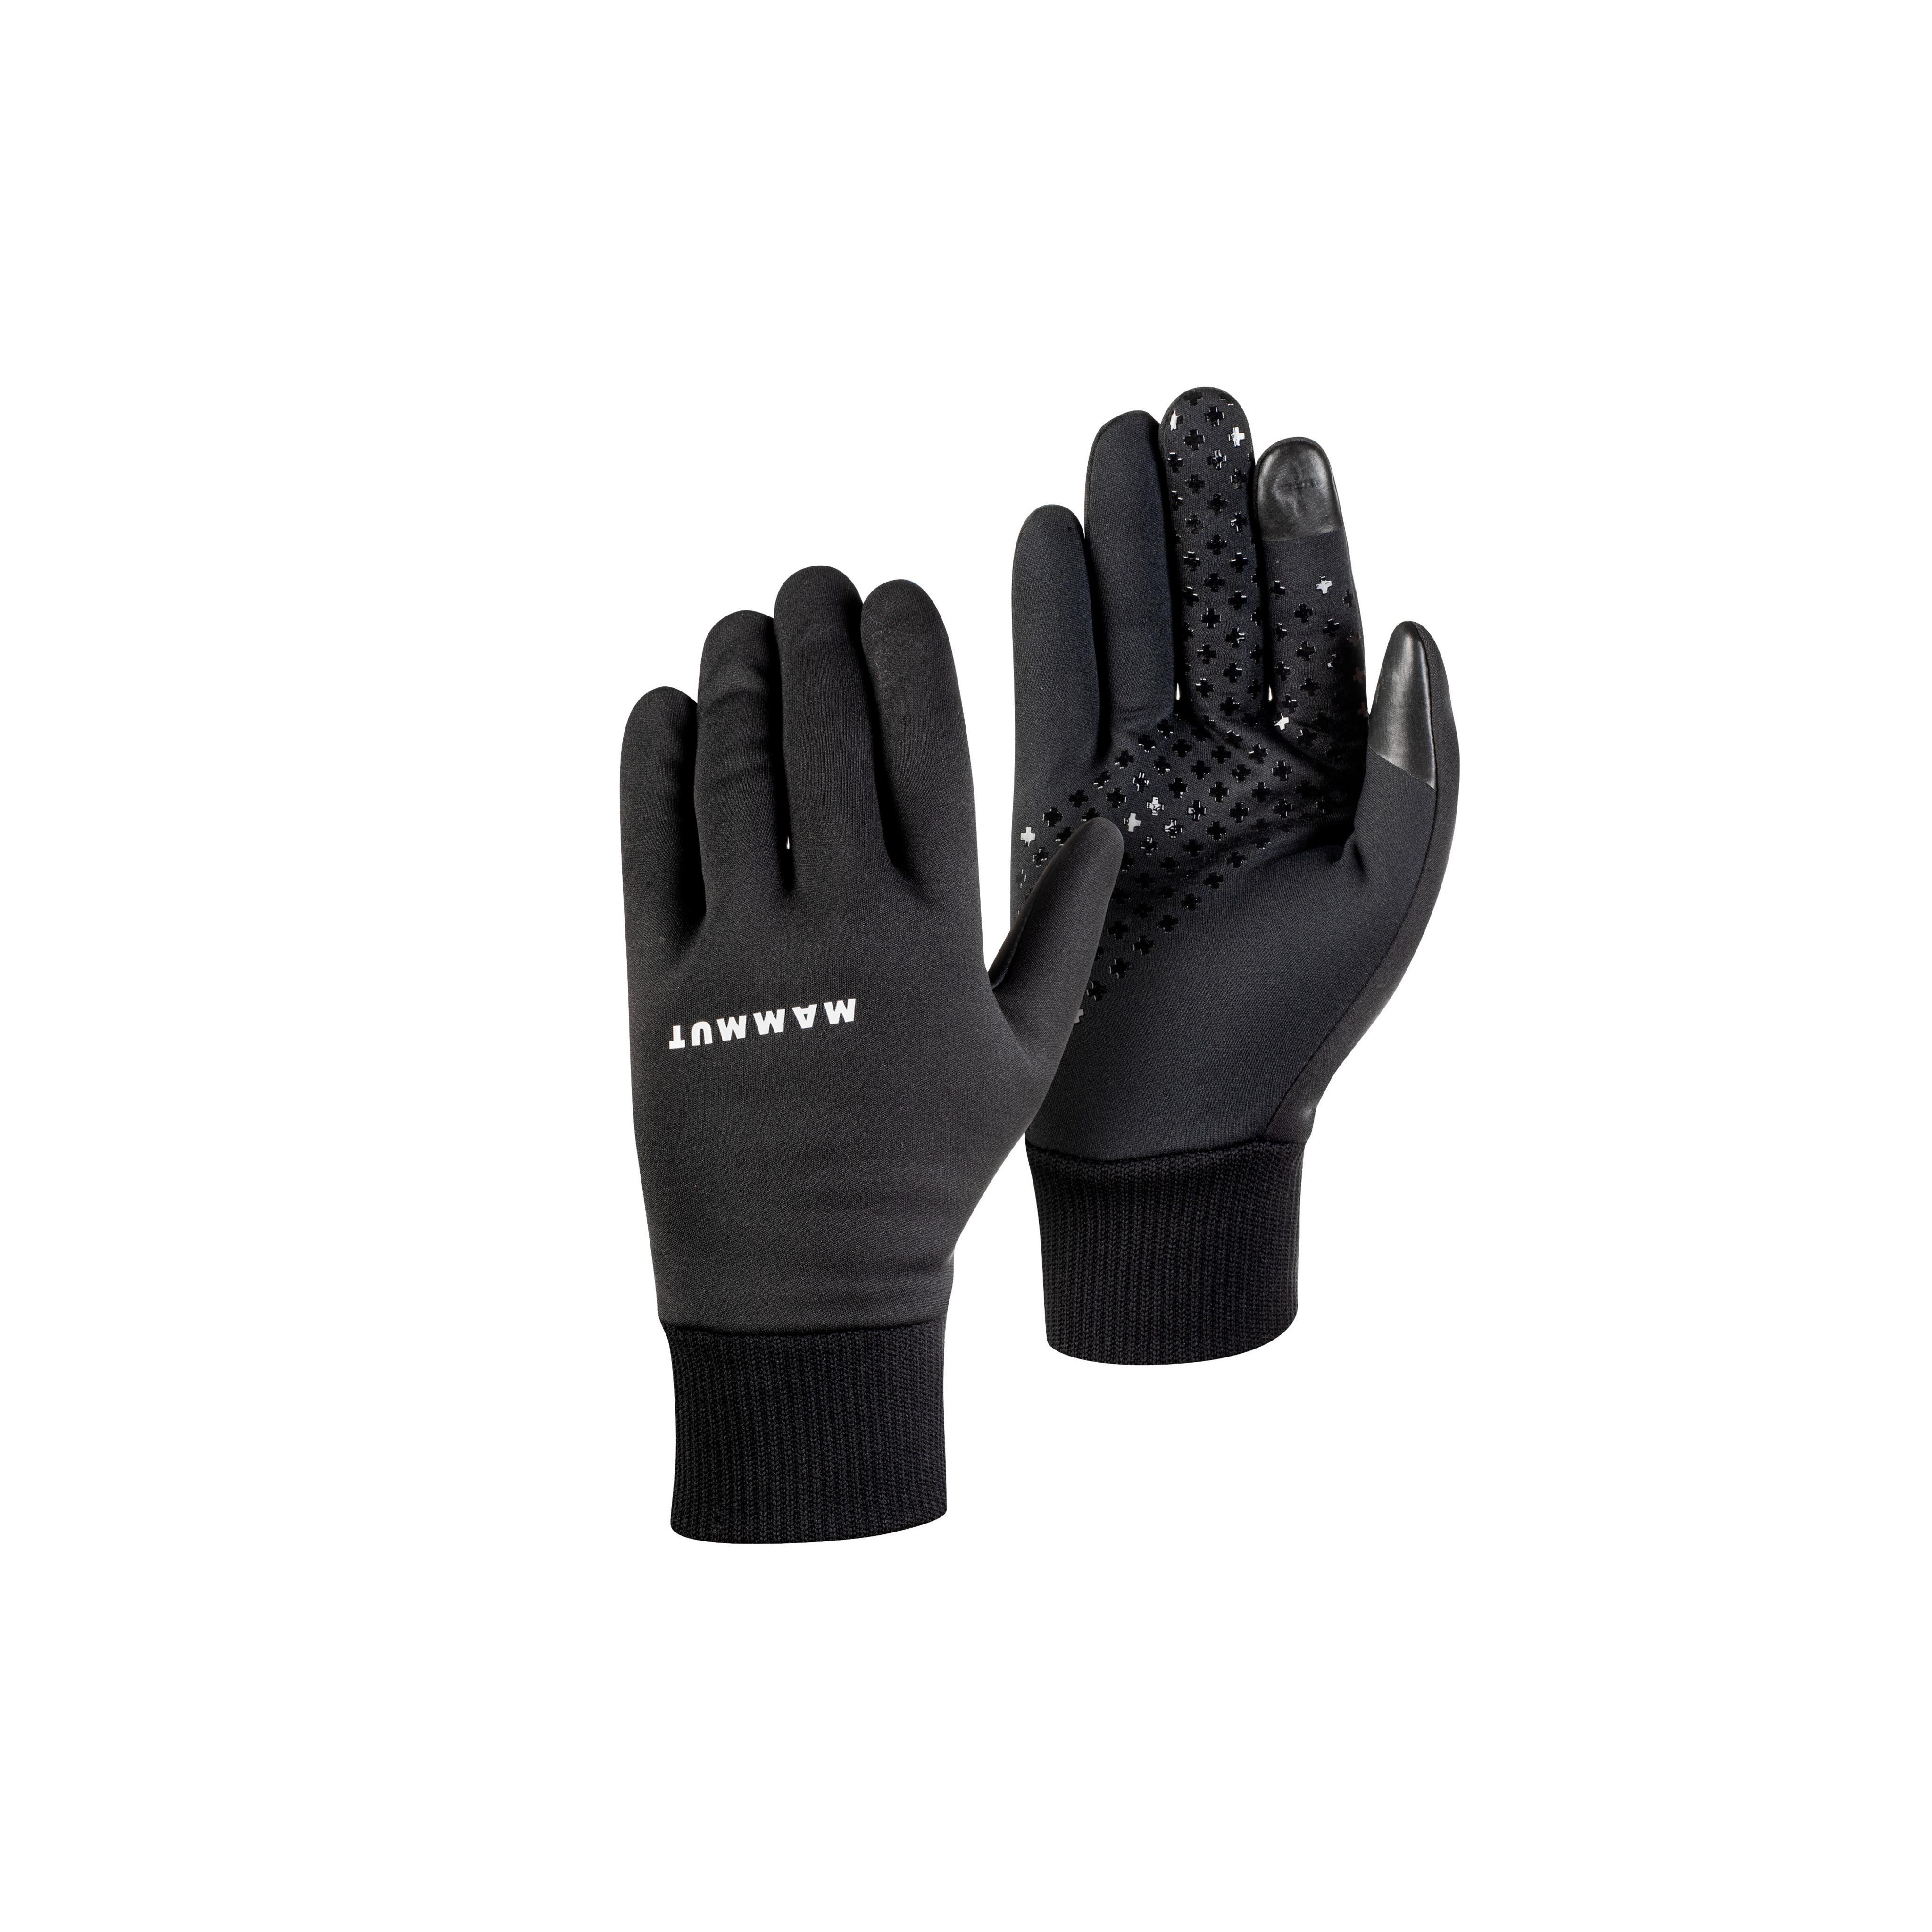 Stretch Pro WS Glove - 6, black product image